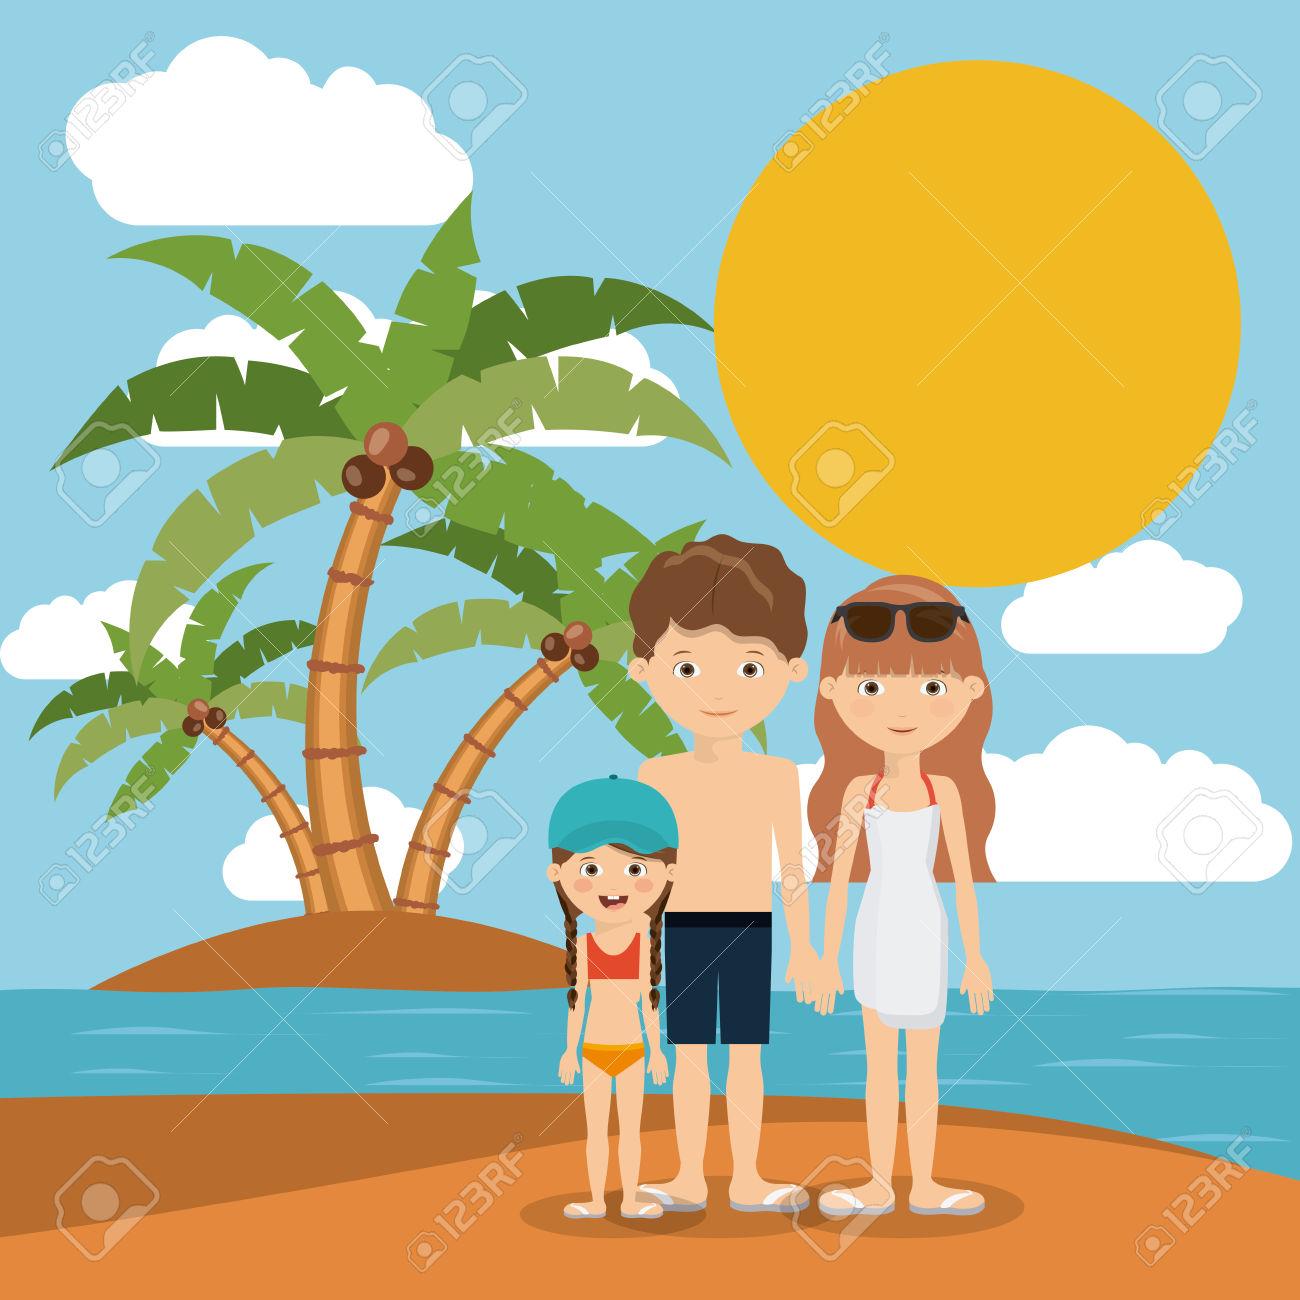 Beach clipart family beach vacation Clipart Design Vacation Beach collection